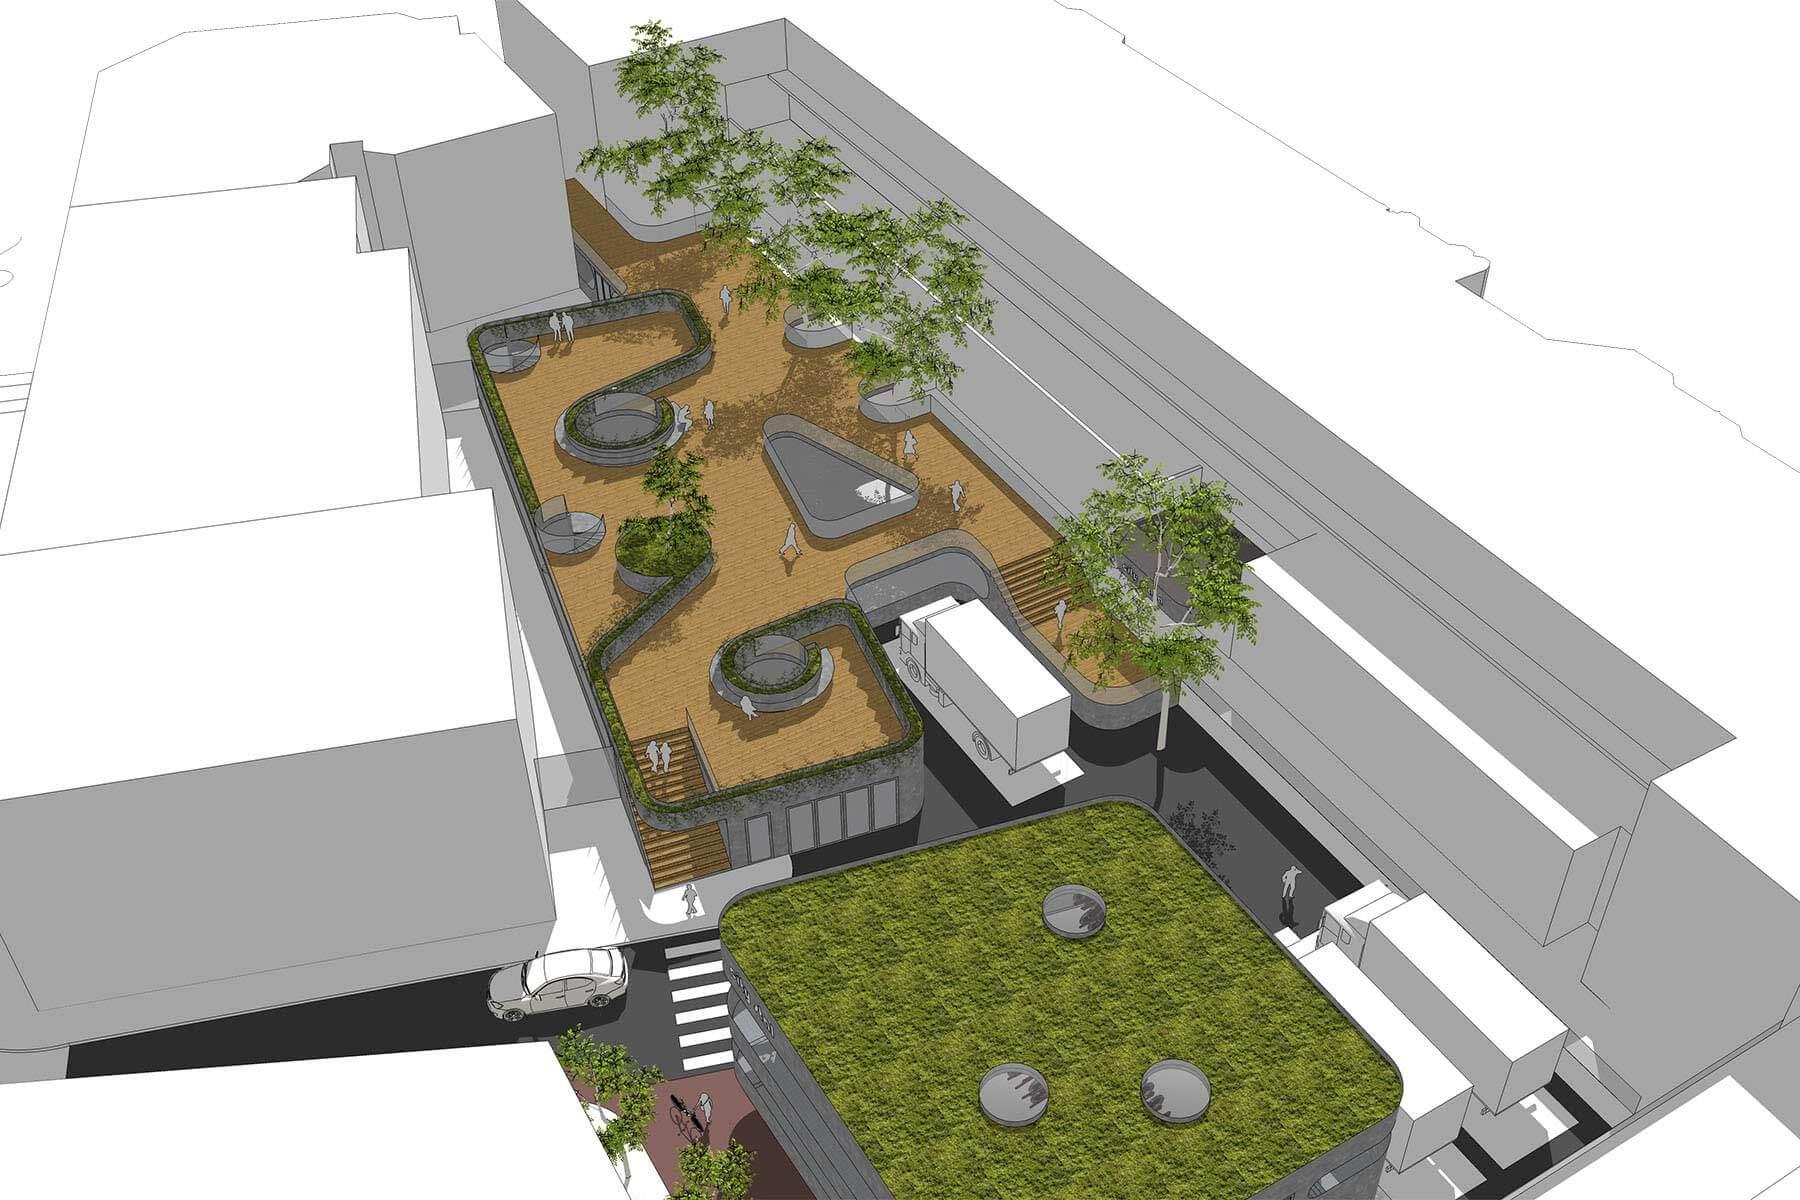 8A-Architecten-city-stal-nieuwegein-10